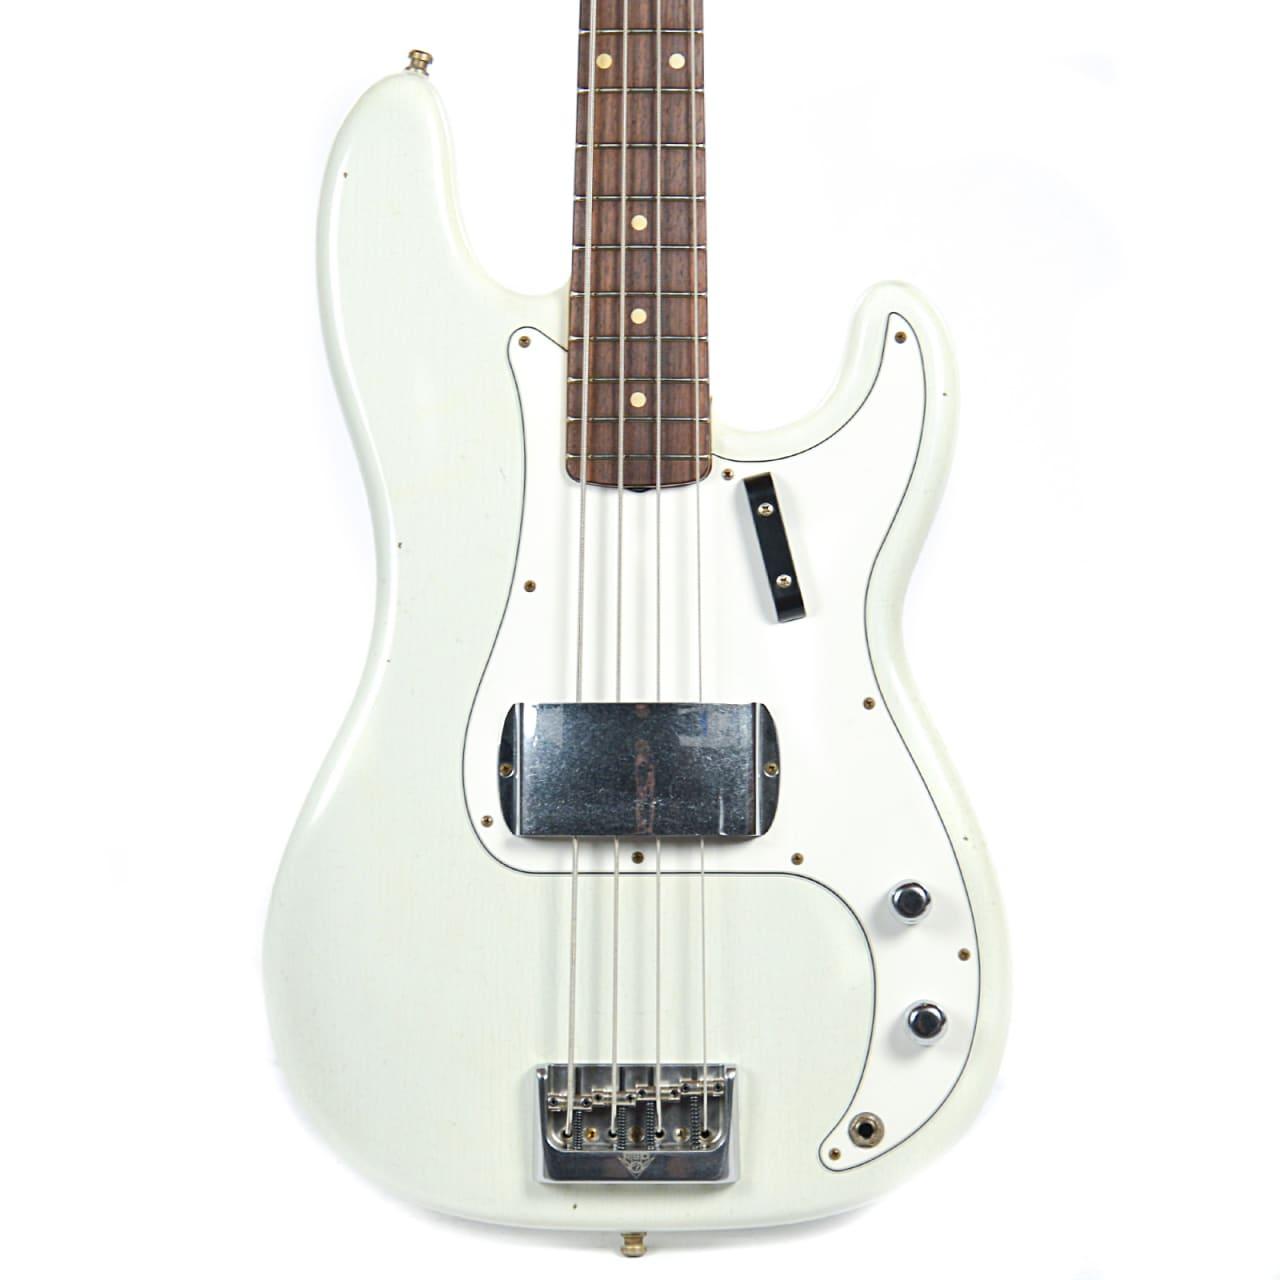 Circuito Jazz Bass Precision : Fender custom shop postmodern precision jazz bass